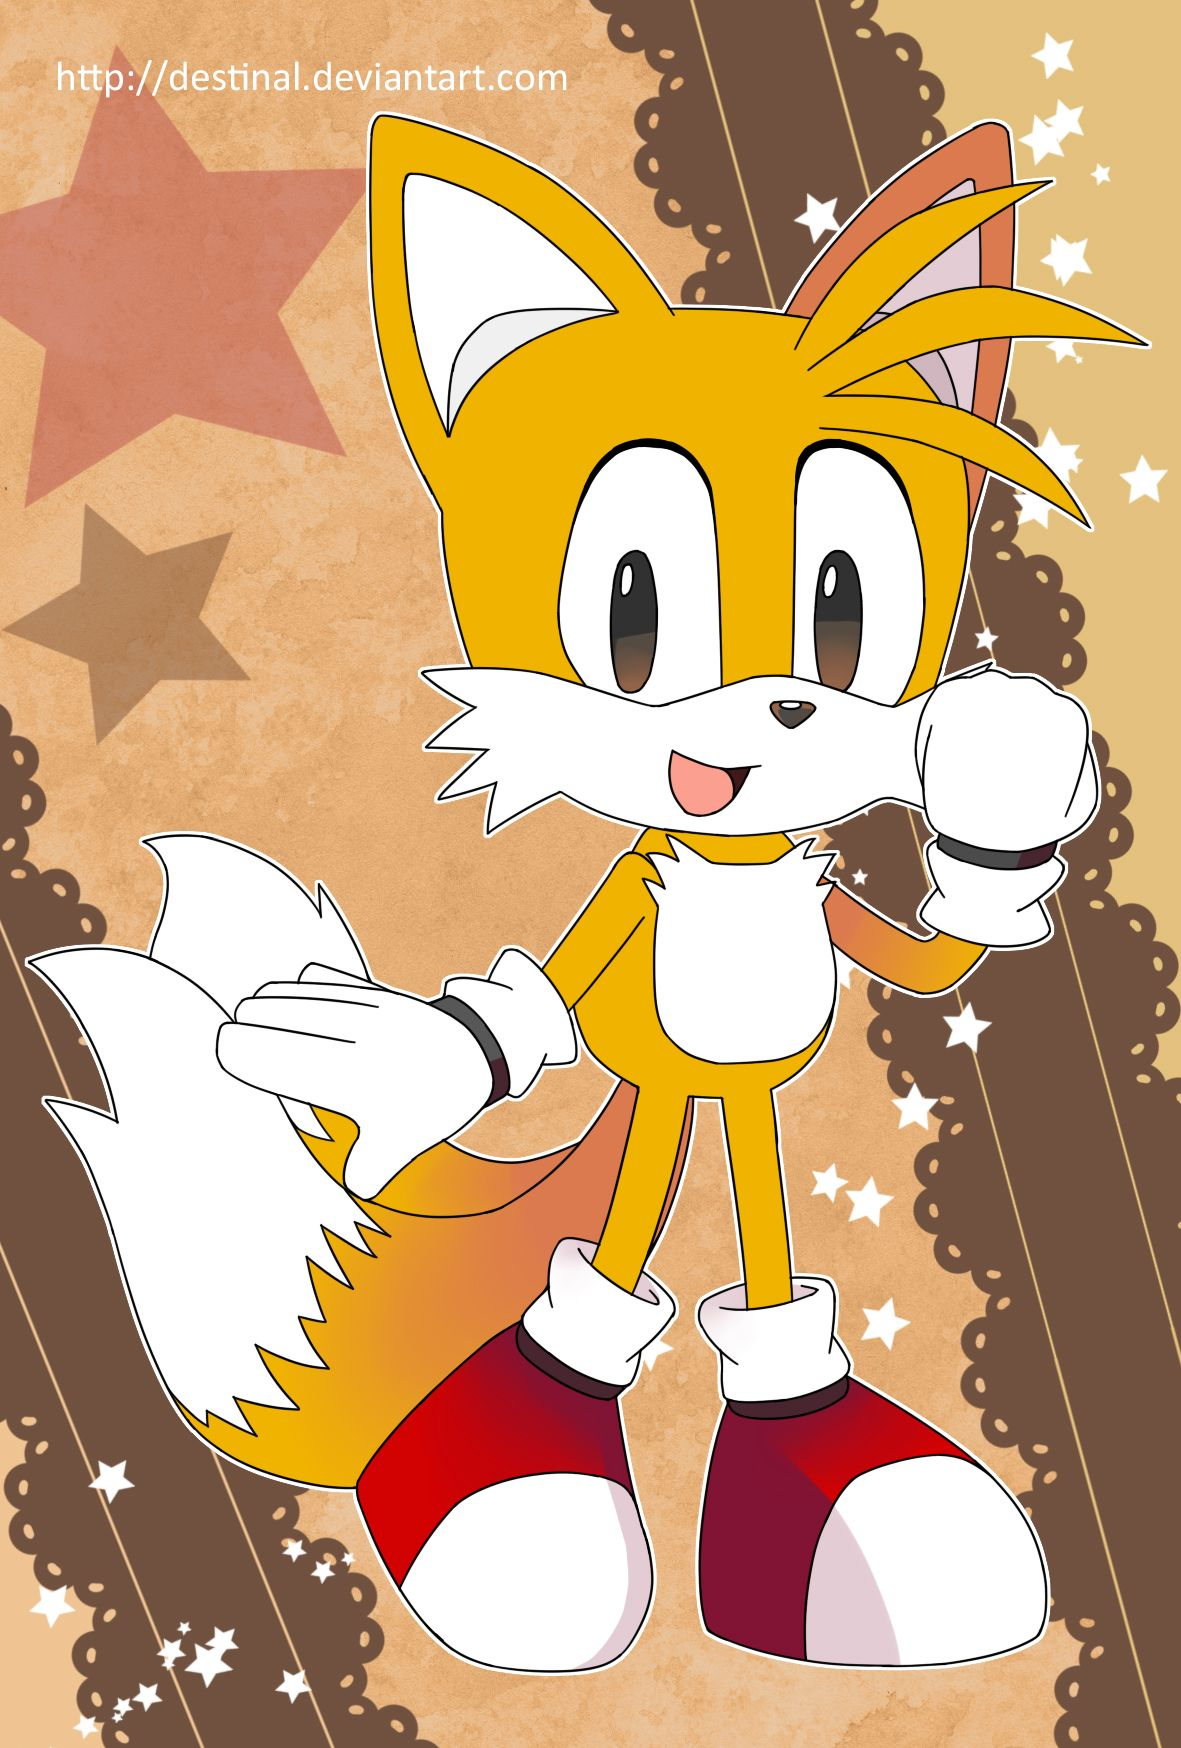 Sonic Postcard - Classic Tails by Crystal-Ribbon.deviantart.com on @DeviantArt